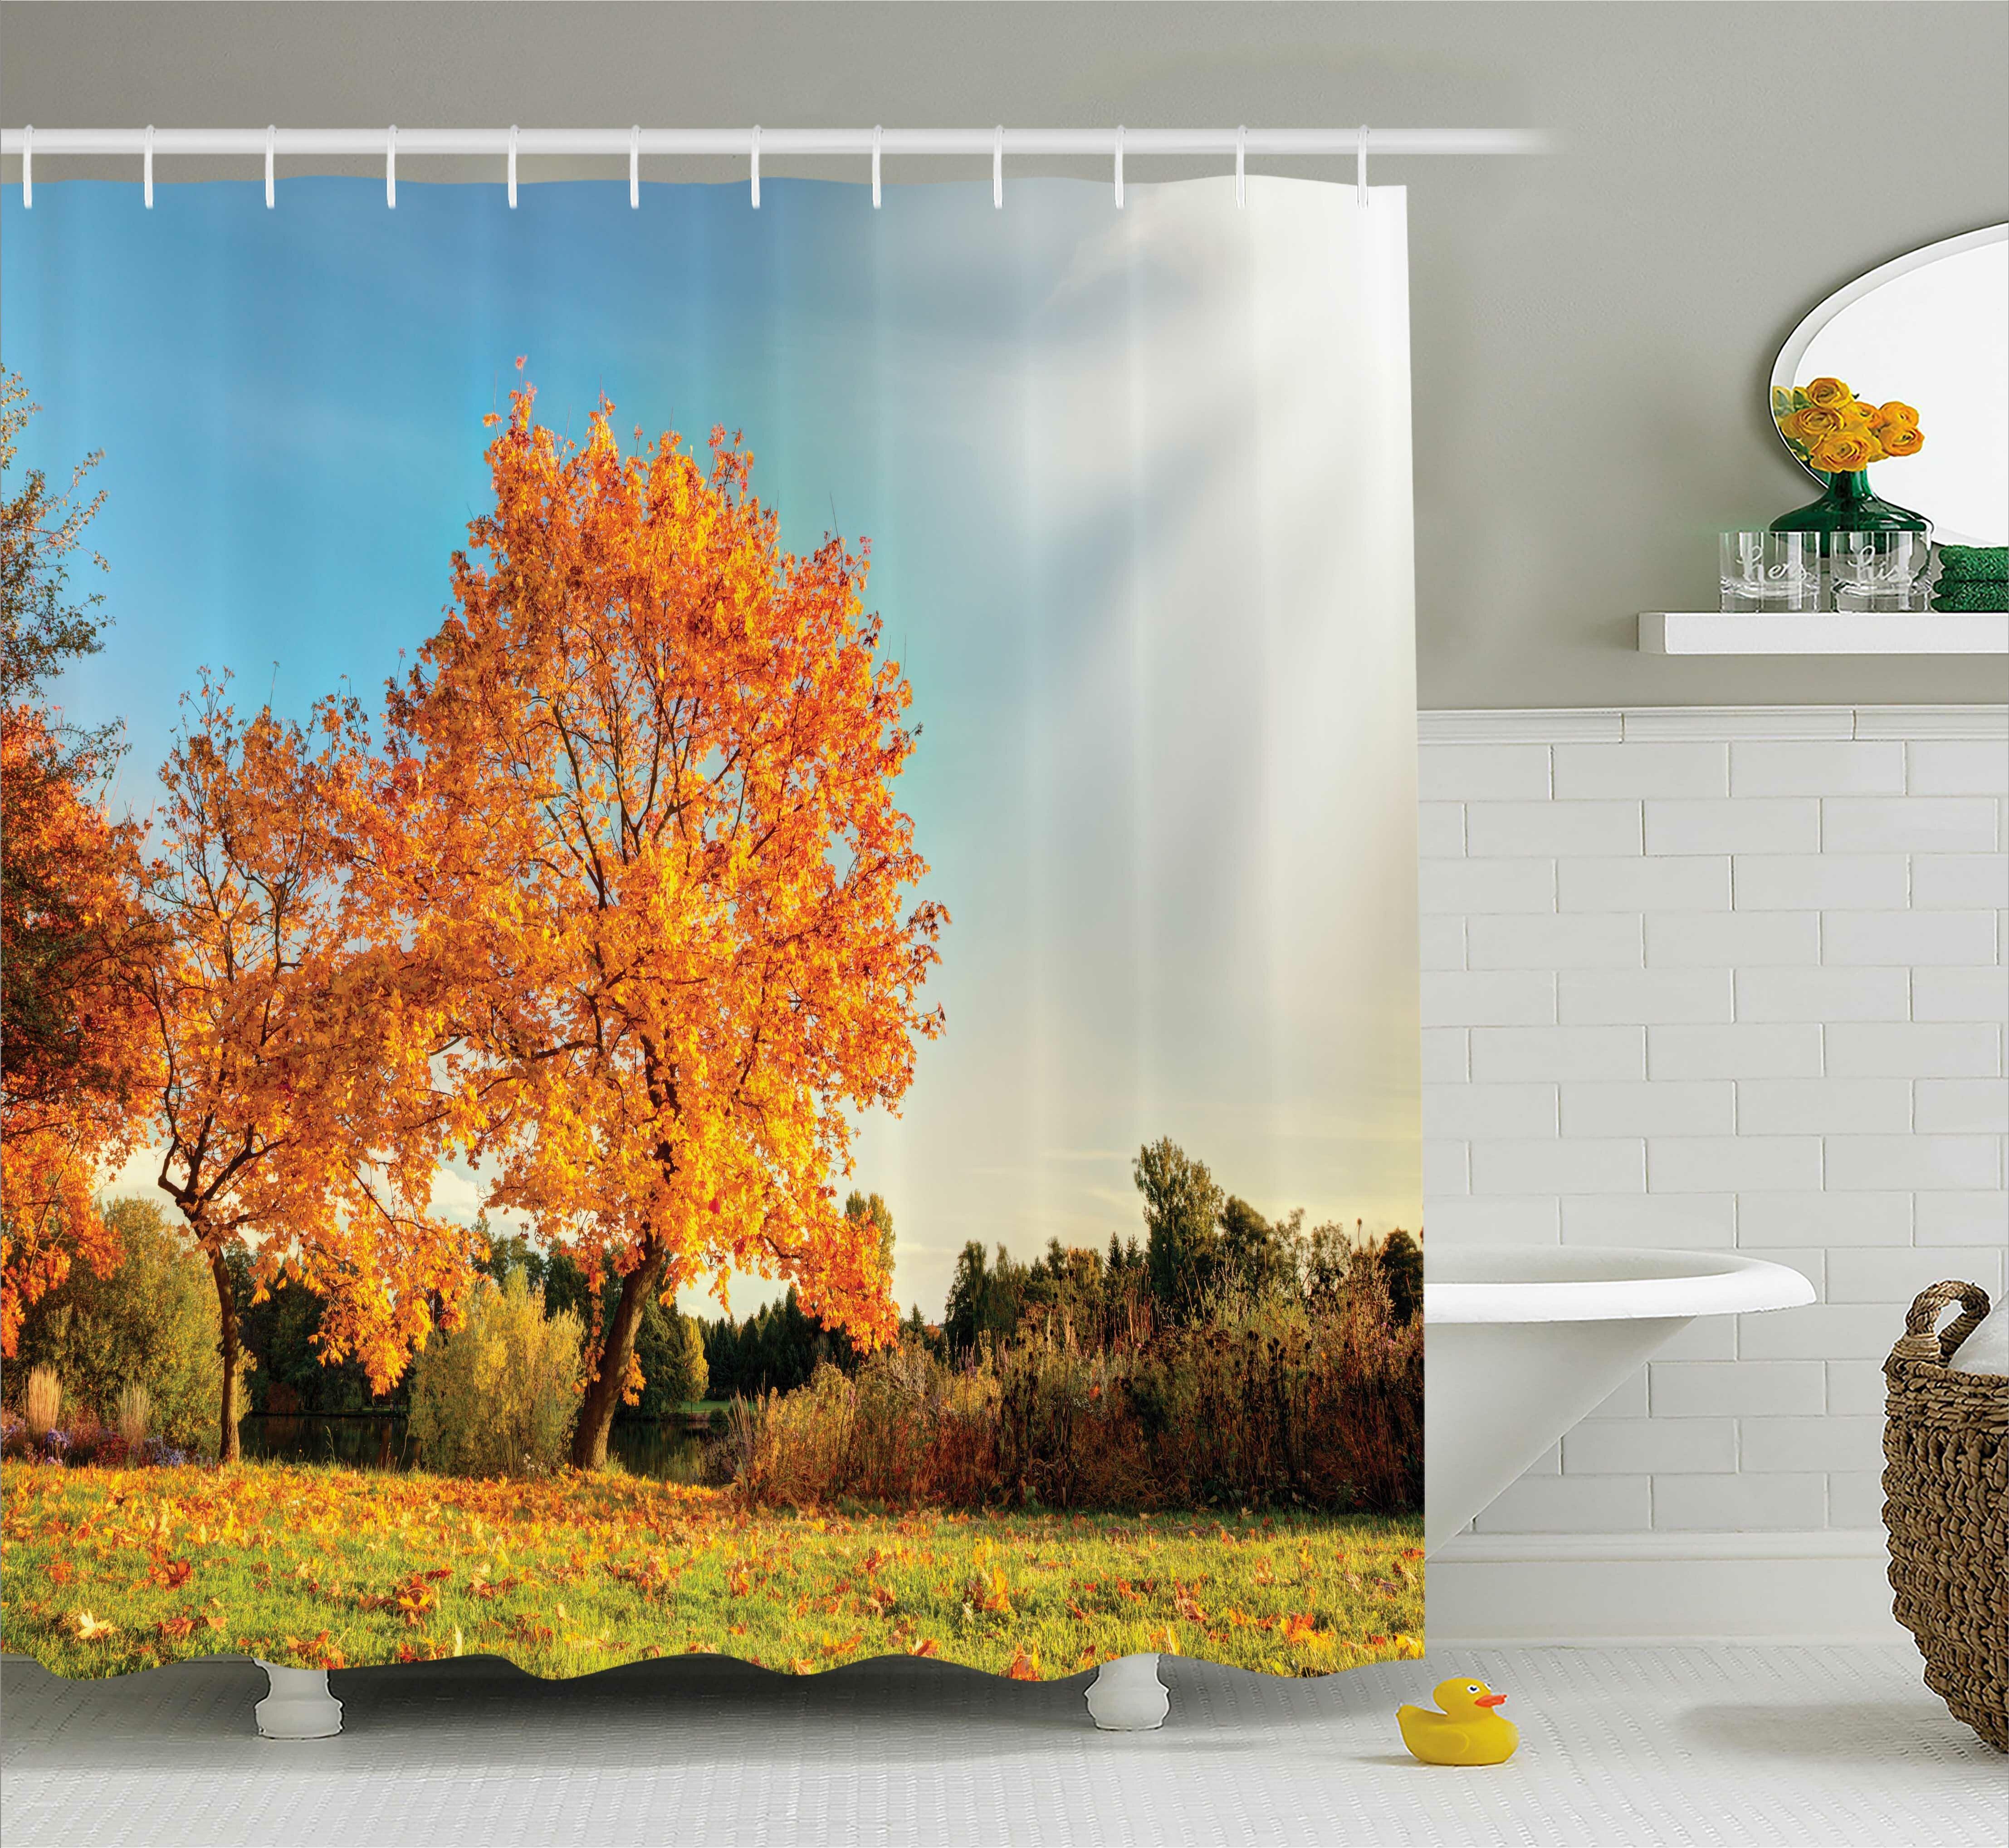 Winston Porter Bleeker Decor Maple Tree Autumn Shower Curtain U0026 Reviews |  Wayfair